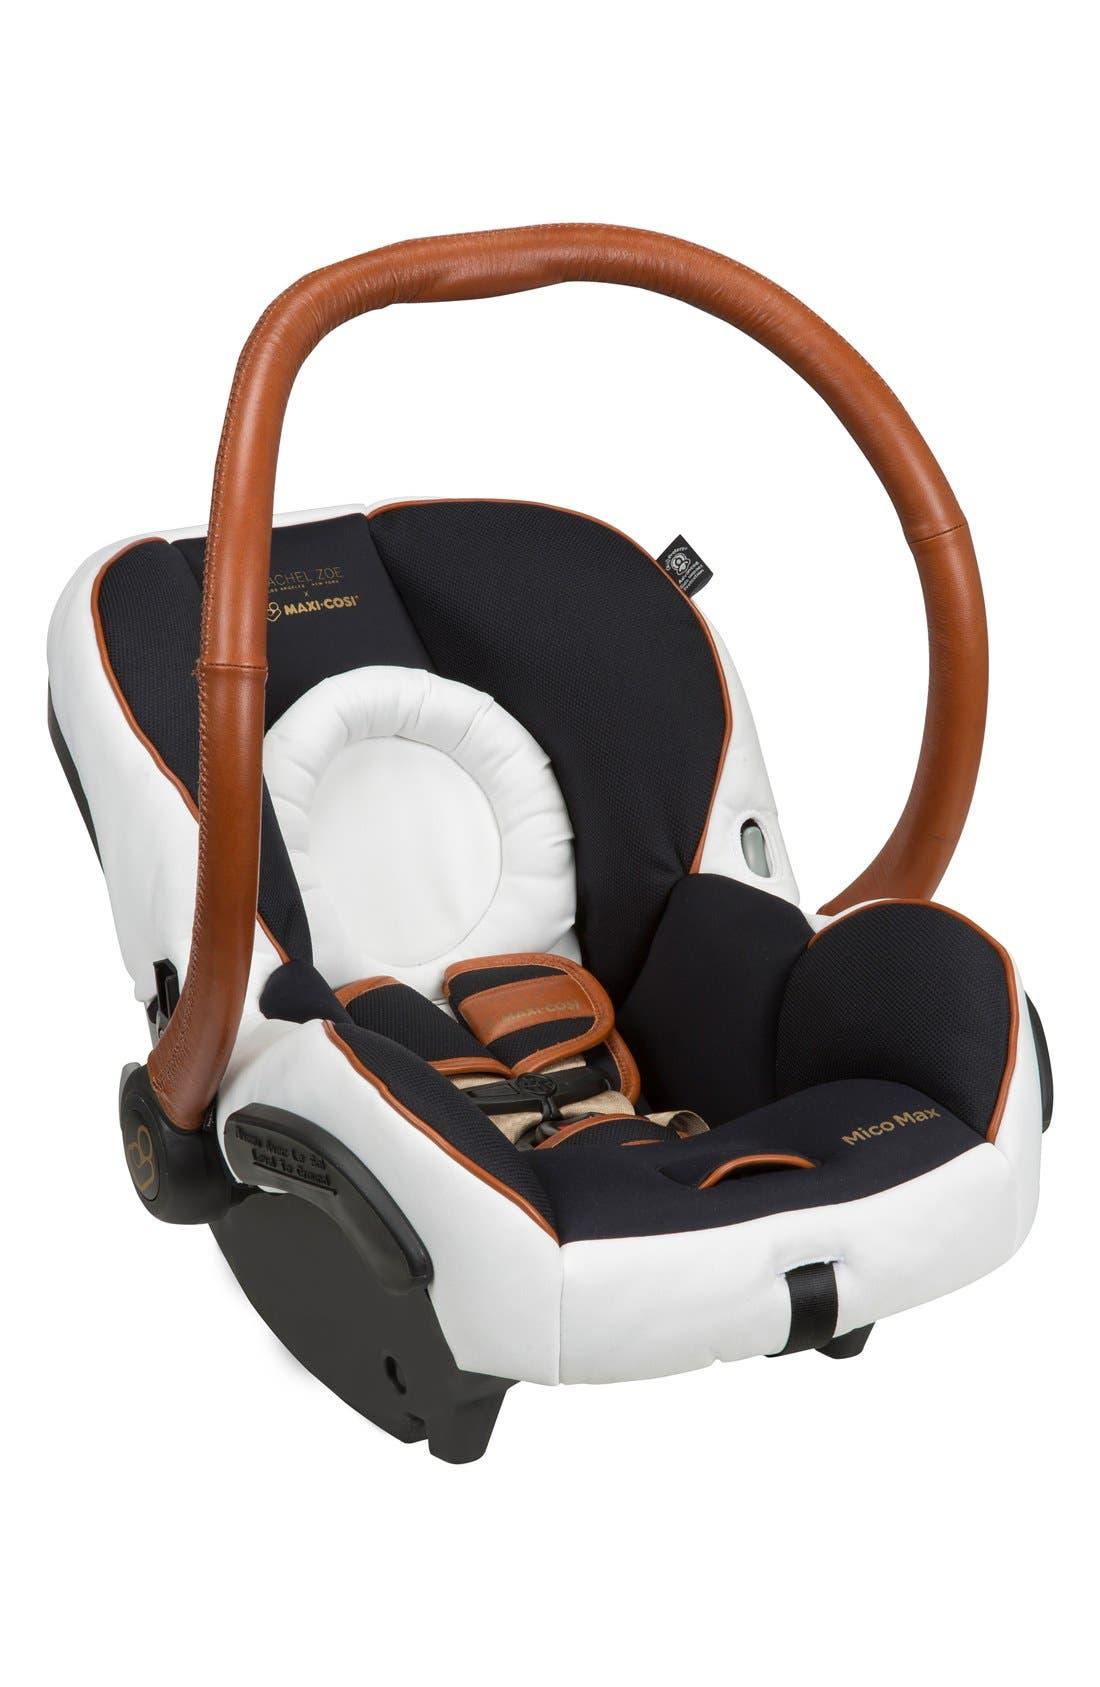 Maxi-Cosi® x Rachel Zoe 'Mico Max 30 - Special Edition' Car Seat